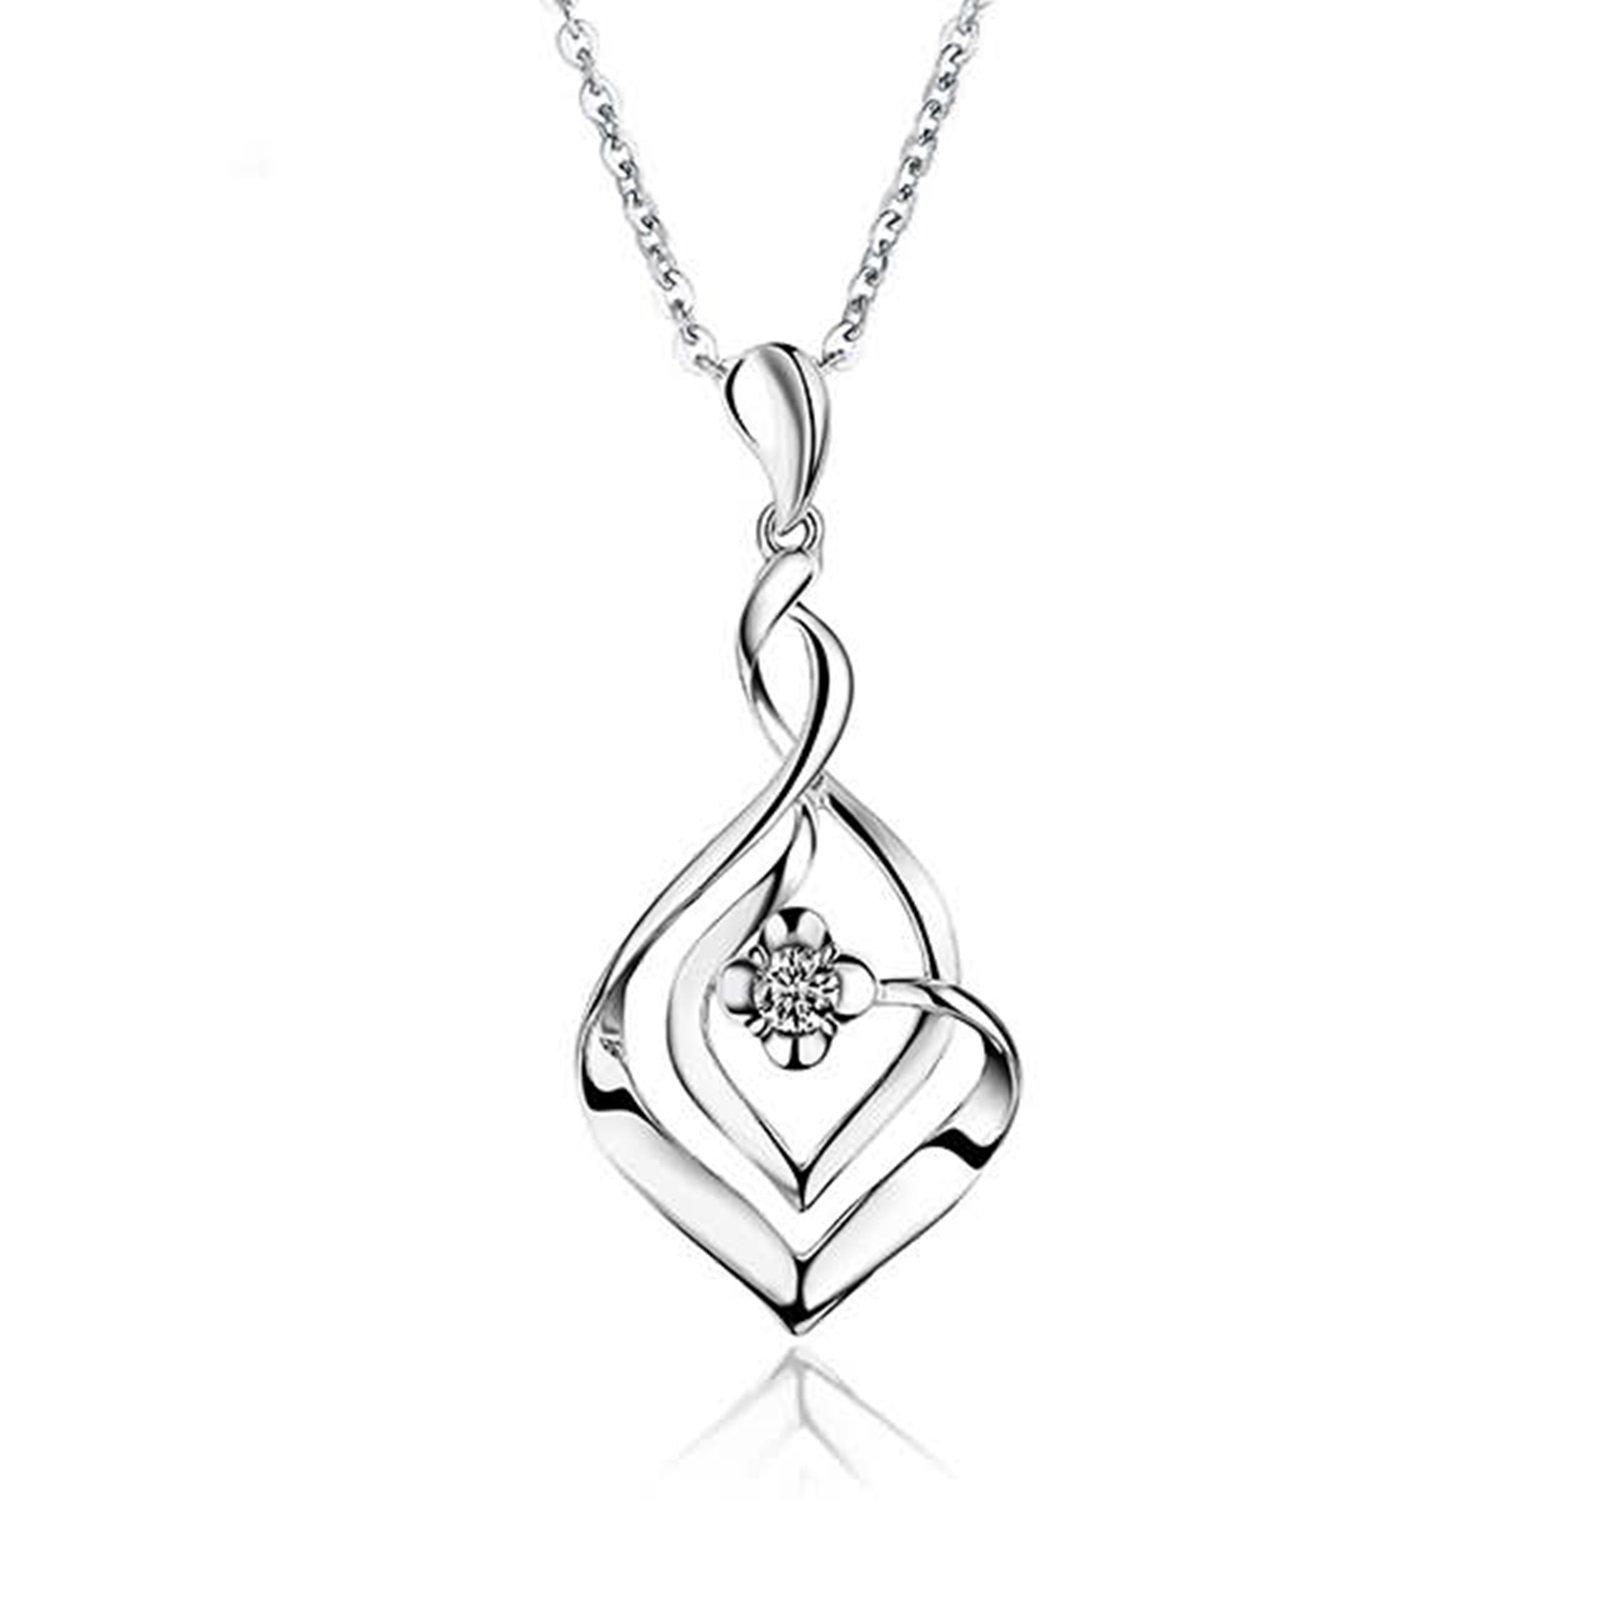 Adisaer 18k(750) White Gold Women Necklace 1.12g Flower Infinity Pendant Round Diamond Wedding Necklace